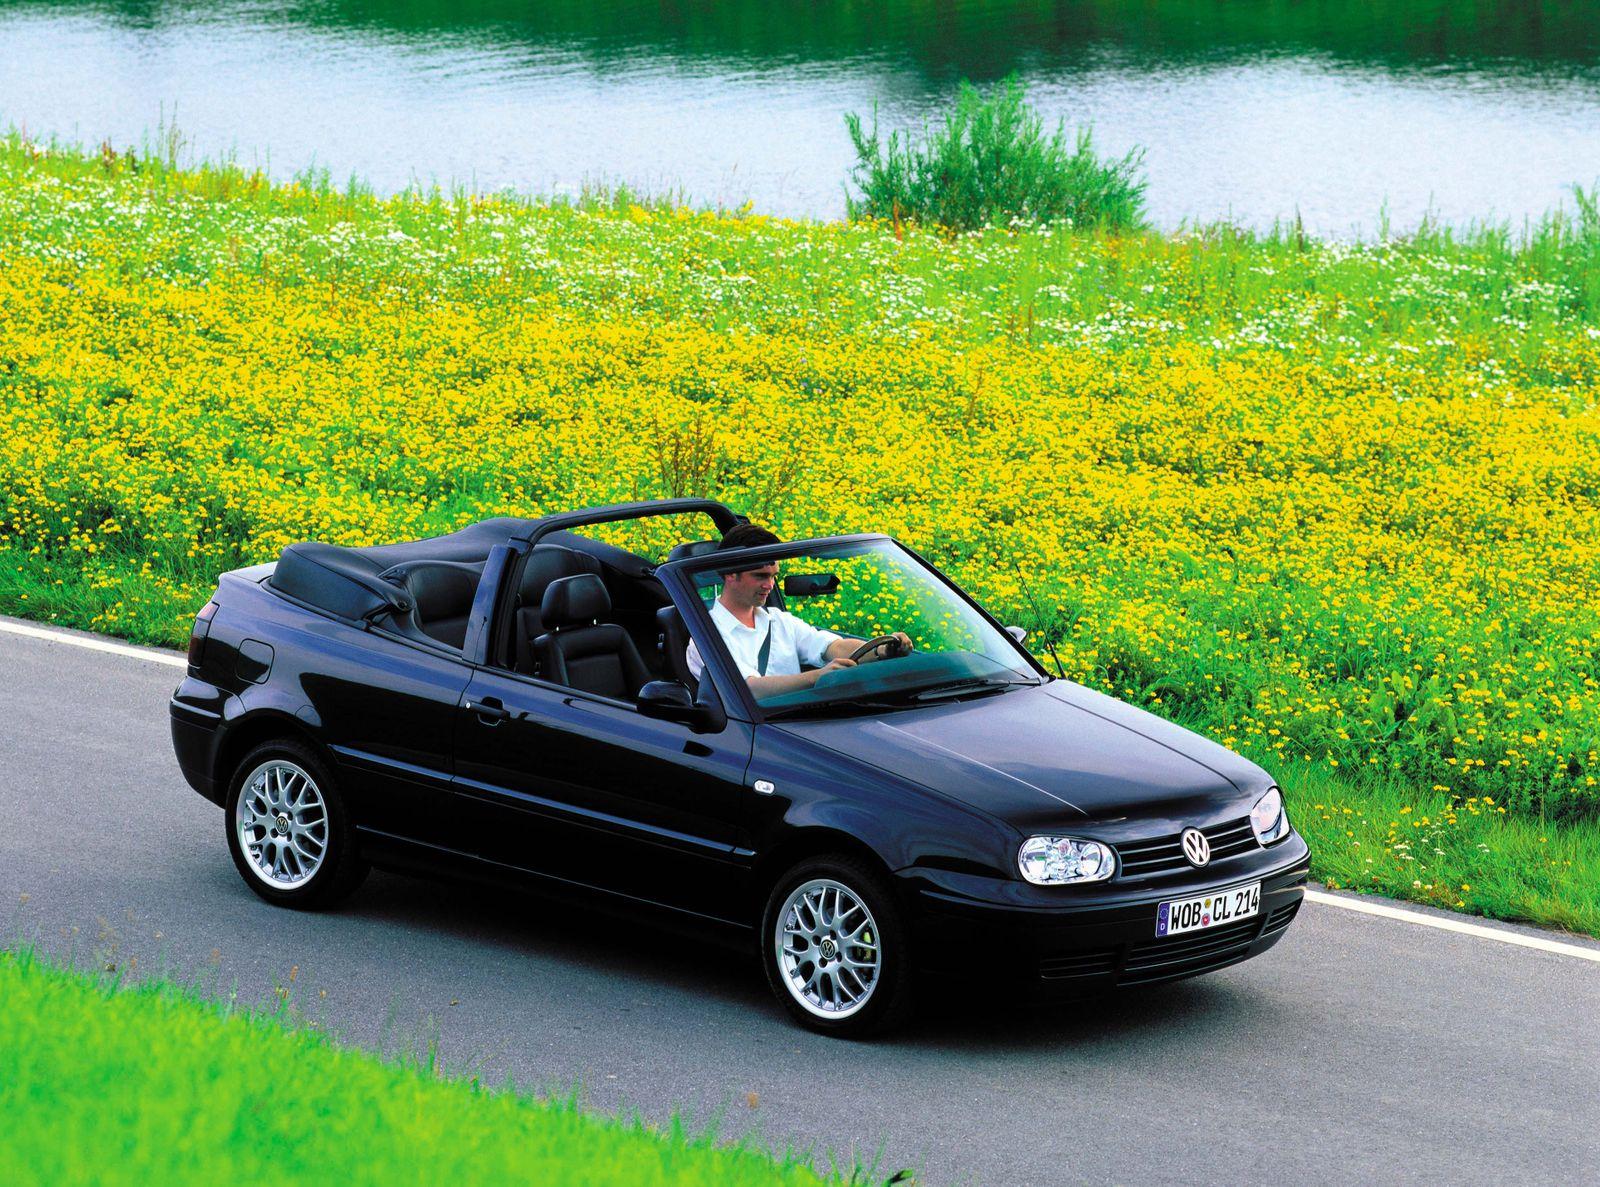 Golf Cabrio (2000) / Golf Cabriolet / Auto